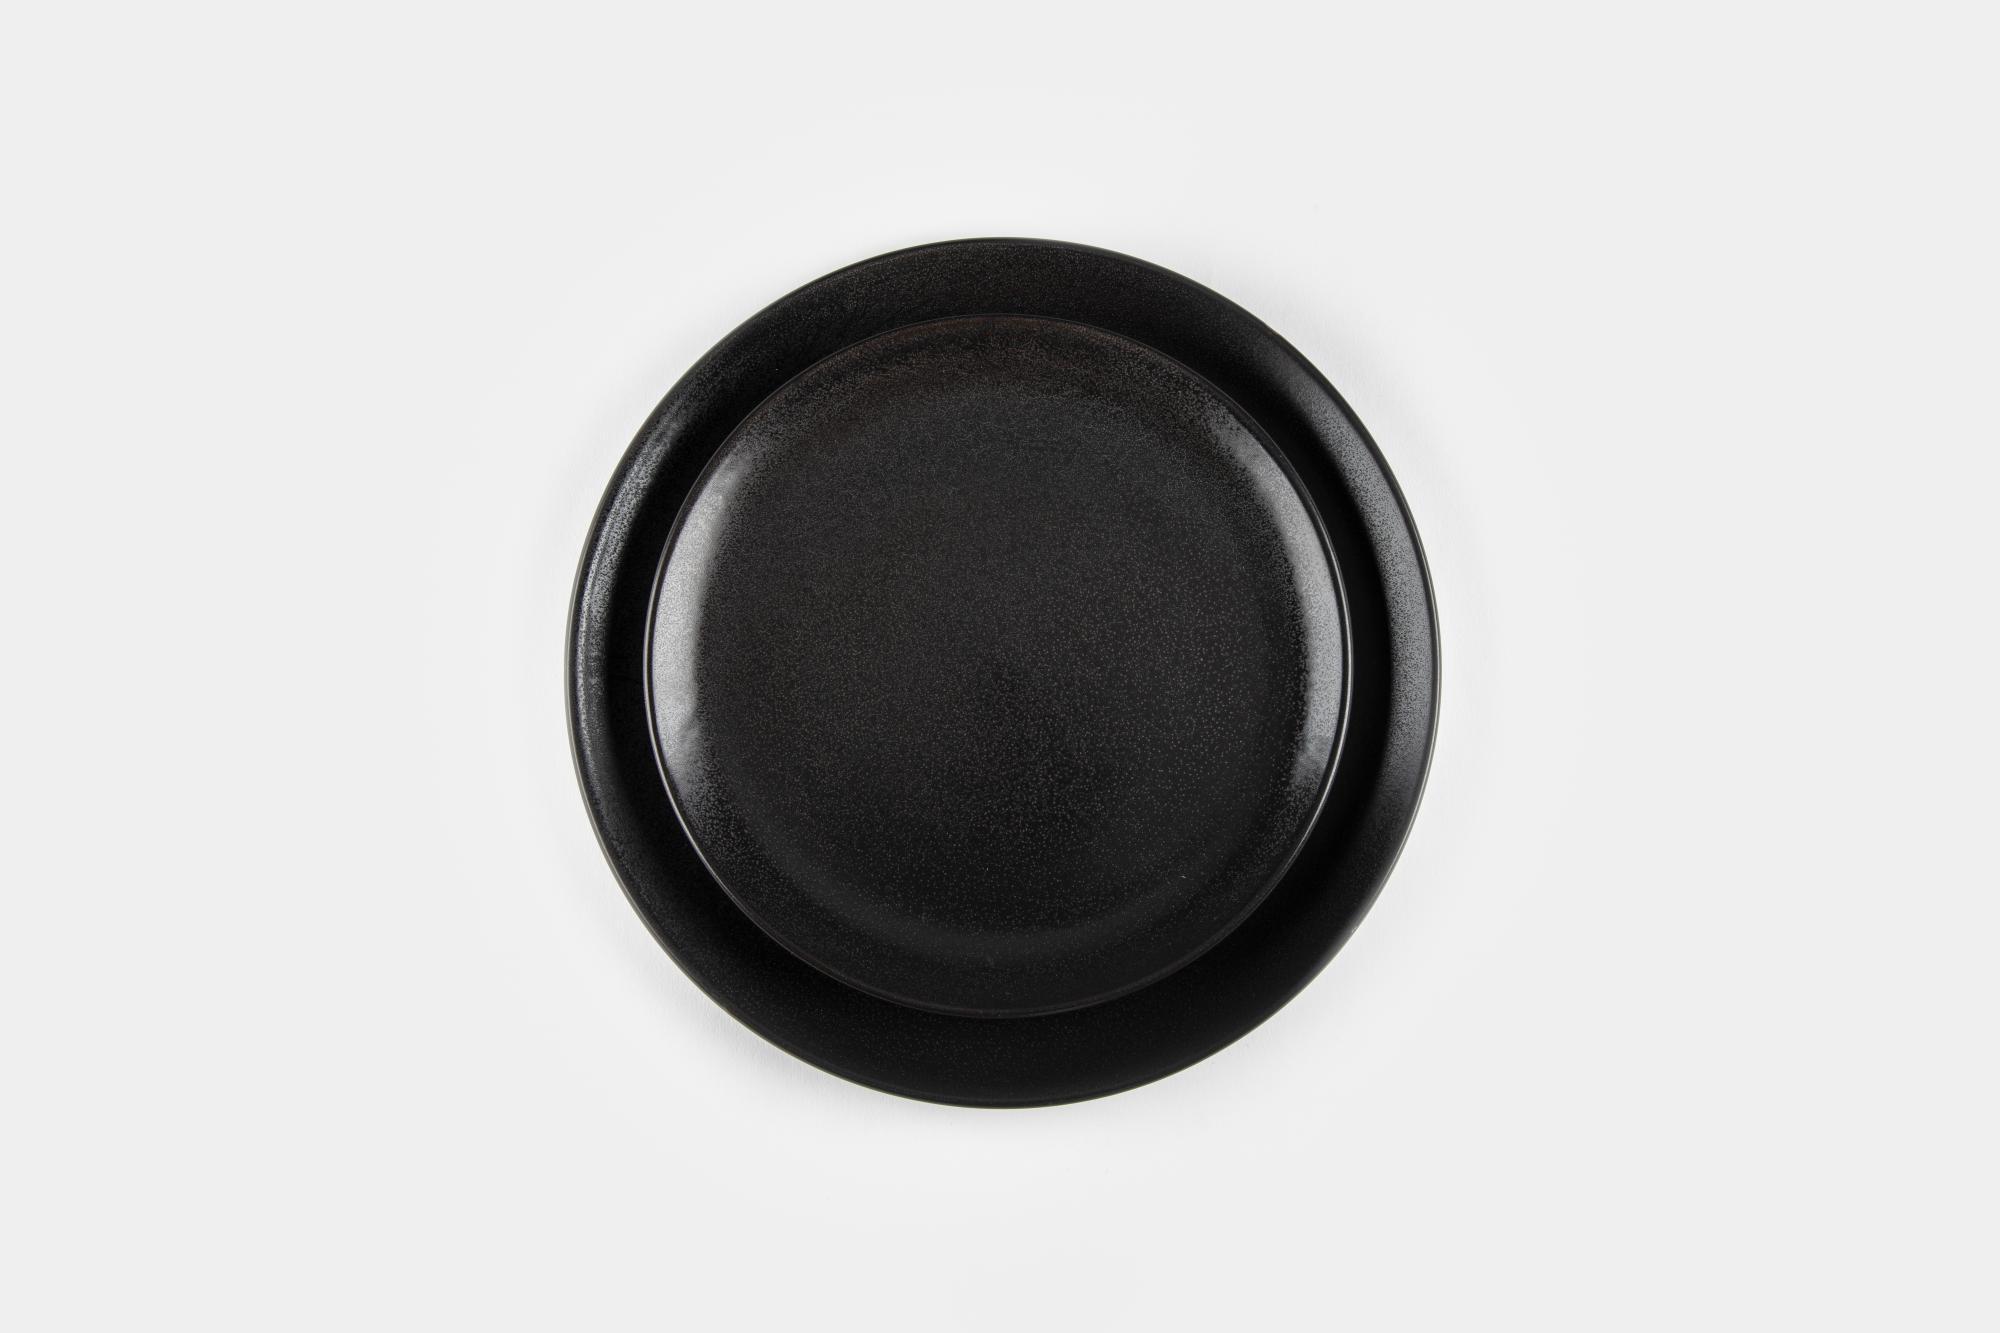 Black plate set - Image 1